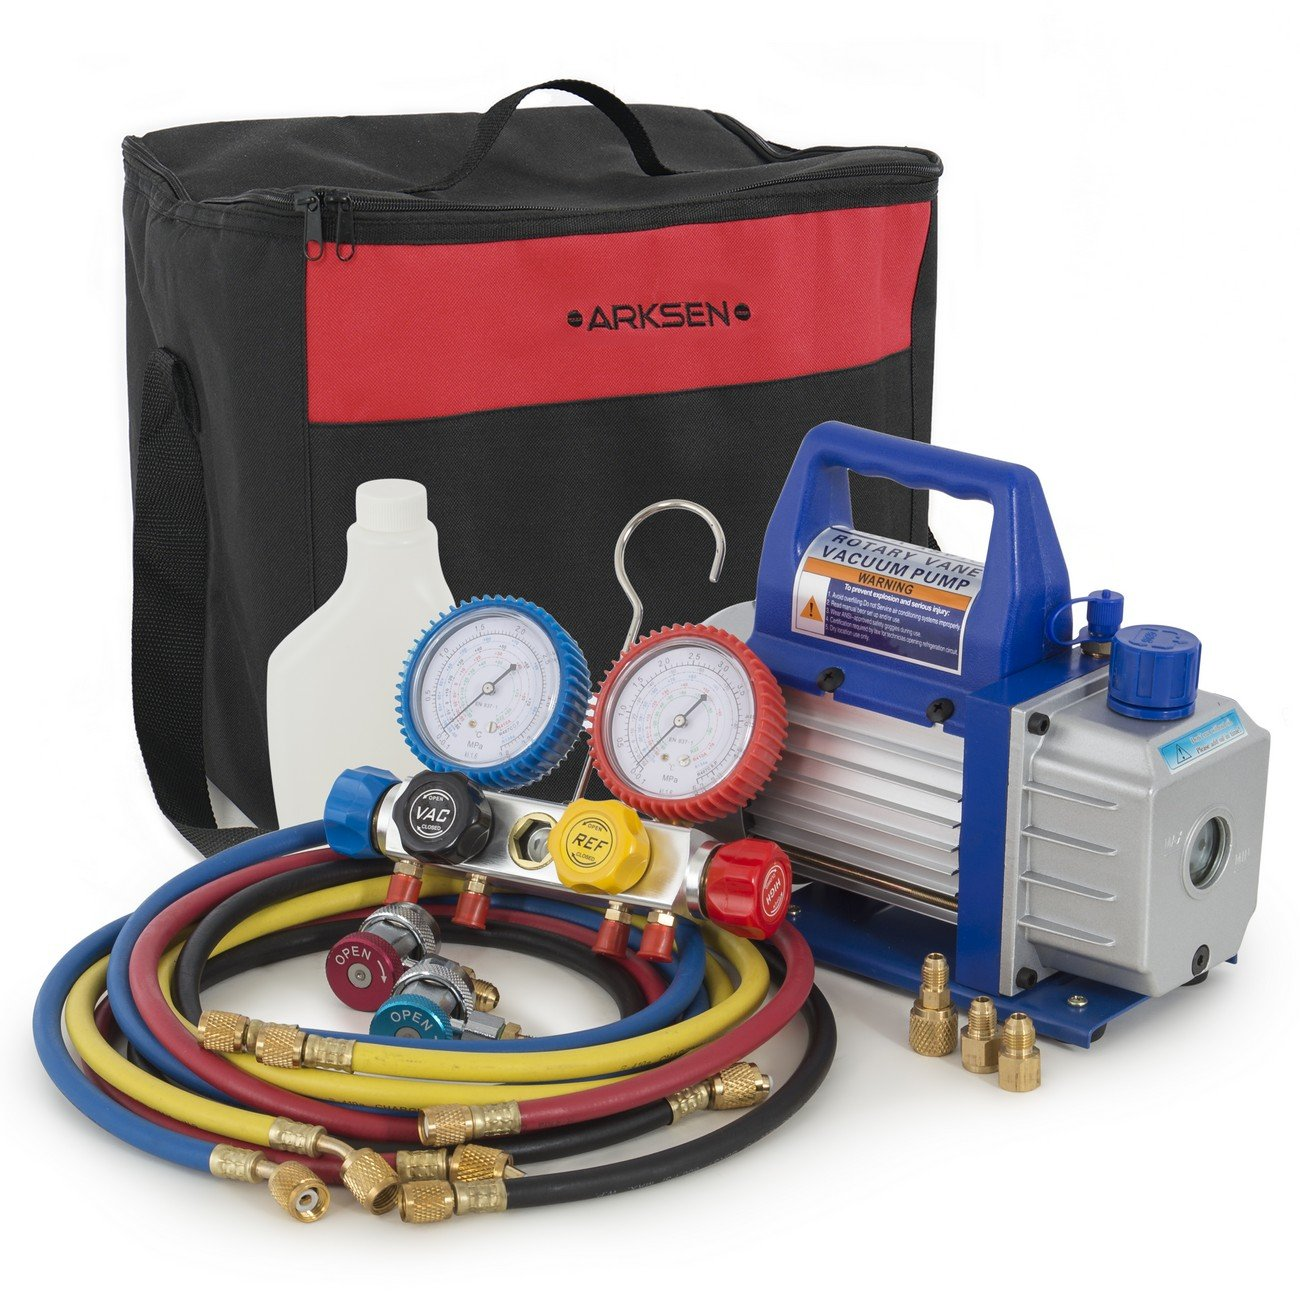 ARKSEN 4 Way A/C Manifold Gauge Carrying Bag Adapters R410 R22 R134 R407C & 3CFM Rotary Vacuum Pump